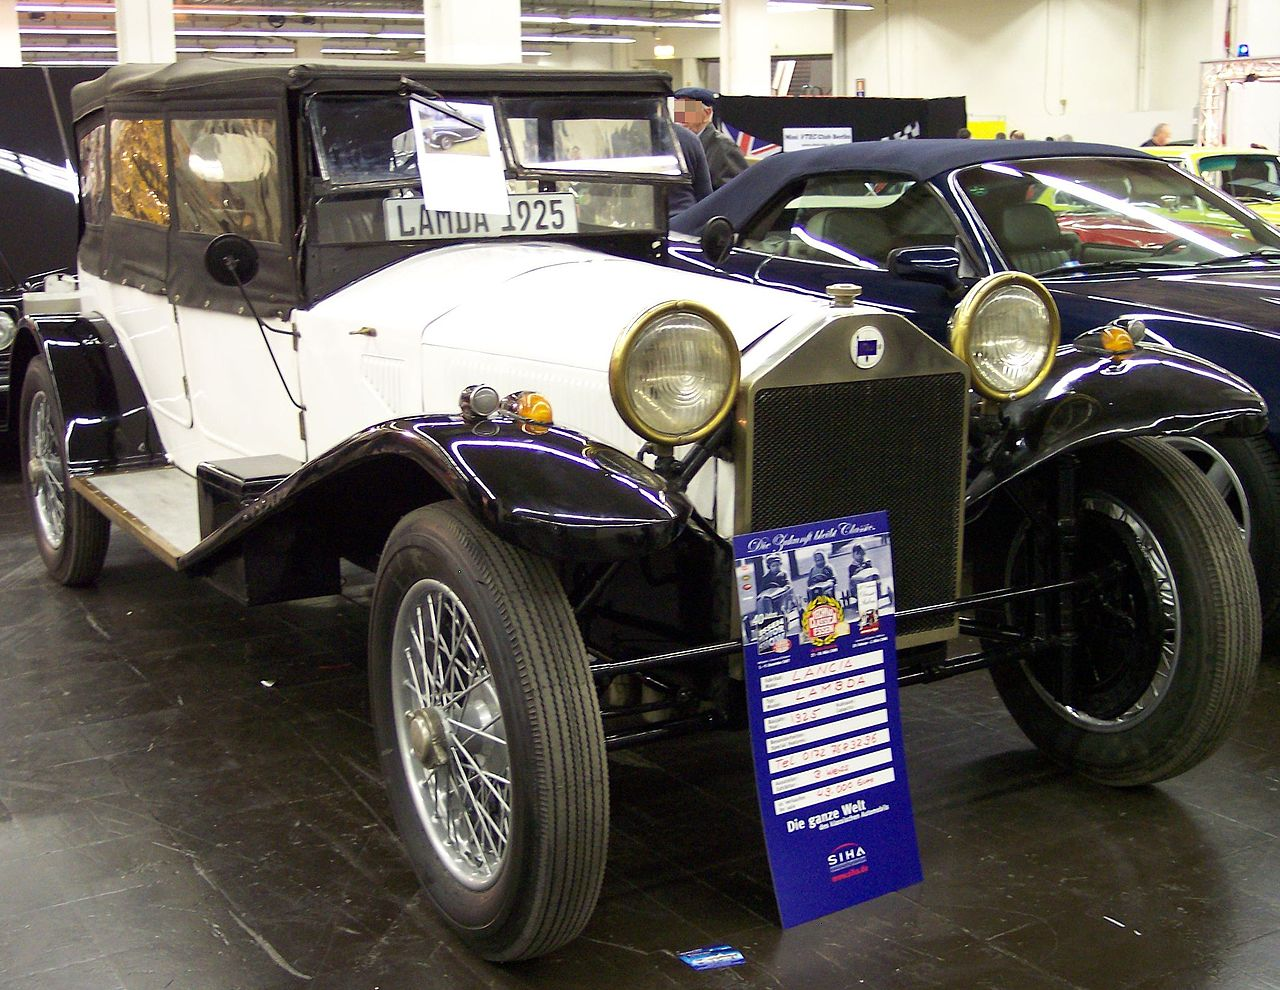 Automobilia Rare Smart Vintage Brass Alvis Eagle Car Mascot Hood Ornament